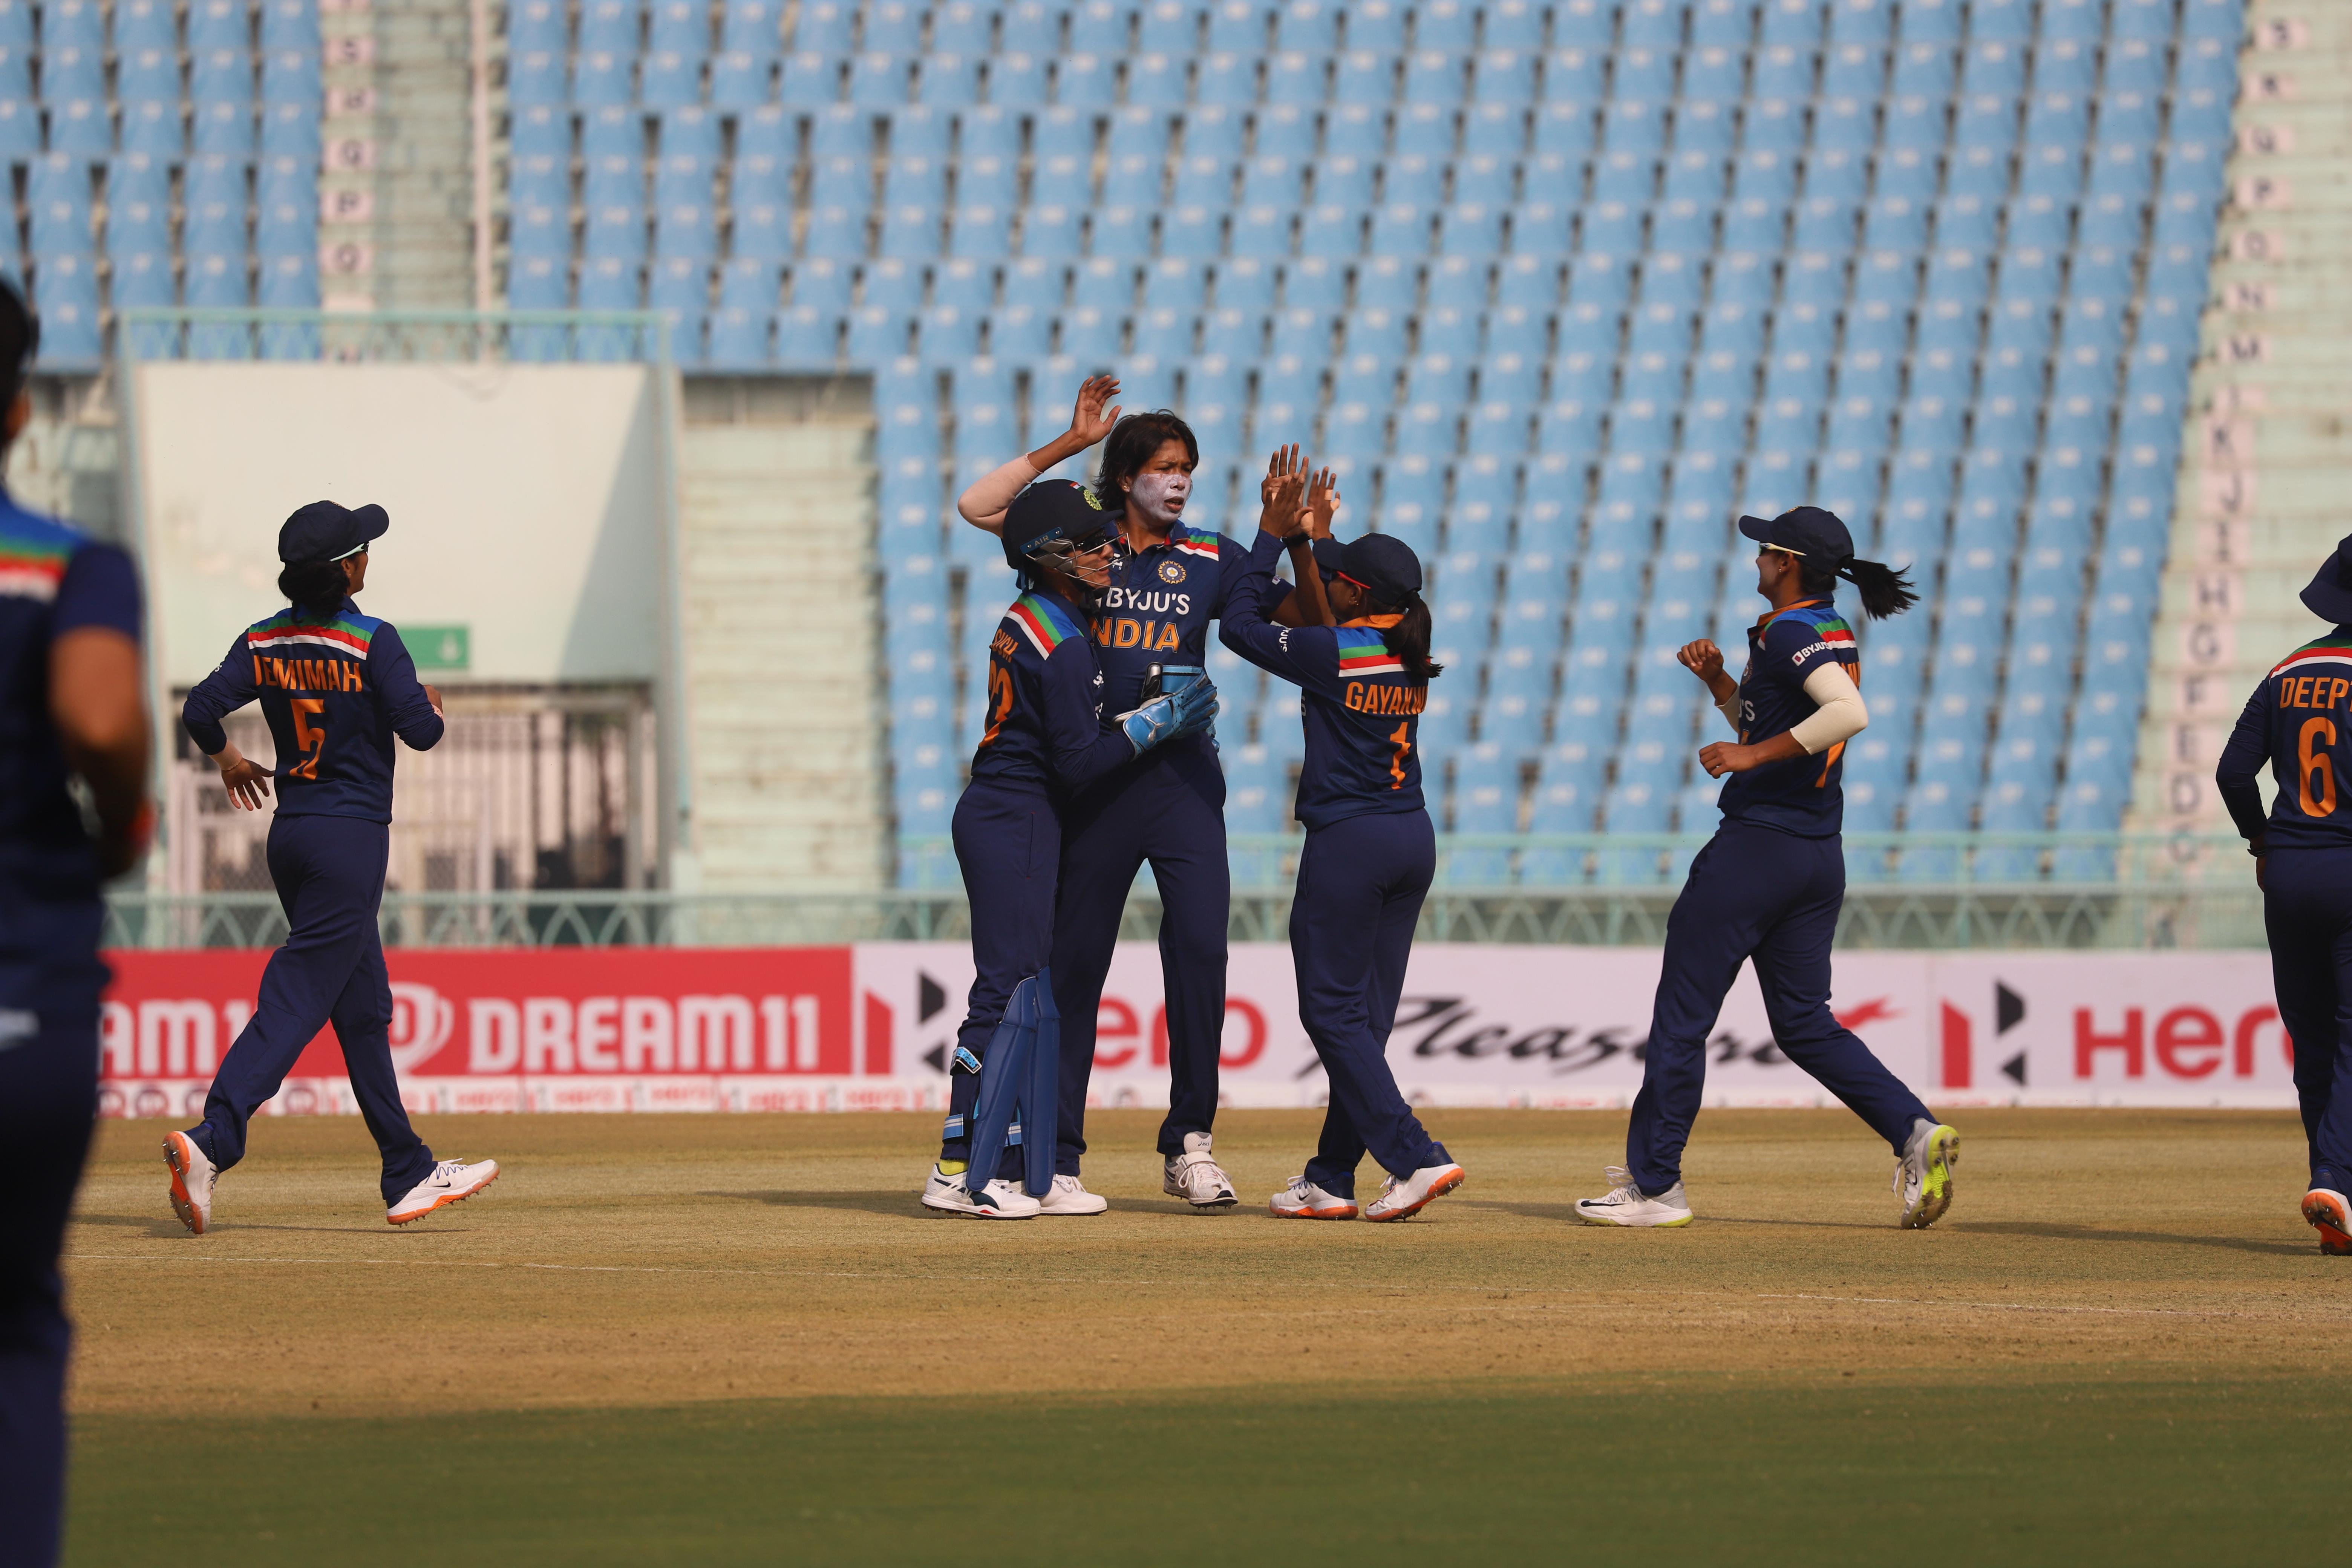 Mandhana, Goswami put on stunning displays as India restore parity - International Cricket Council